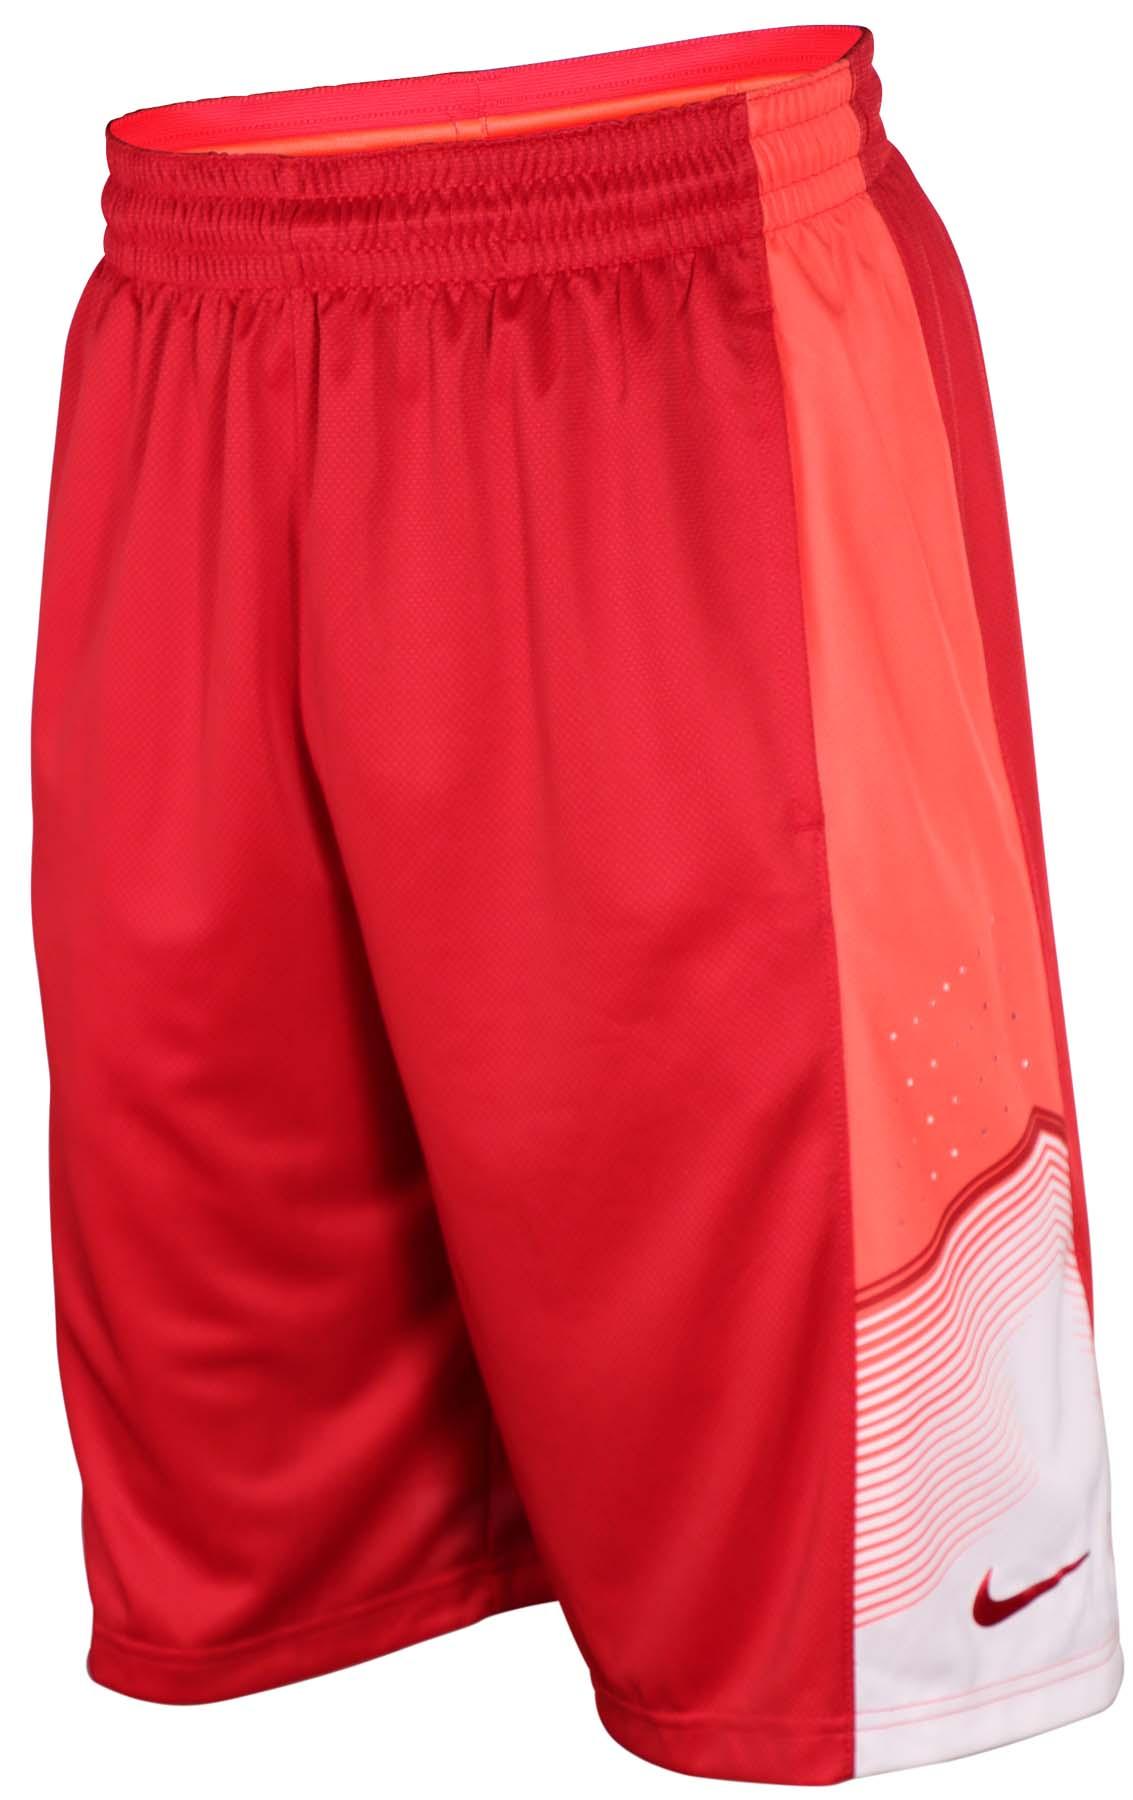 nike men 39 s dri fit elite world tour basketball shorts ebay. Black Bedroom Furniture Sets. Home Design Ideas